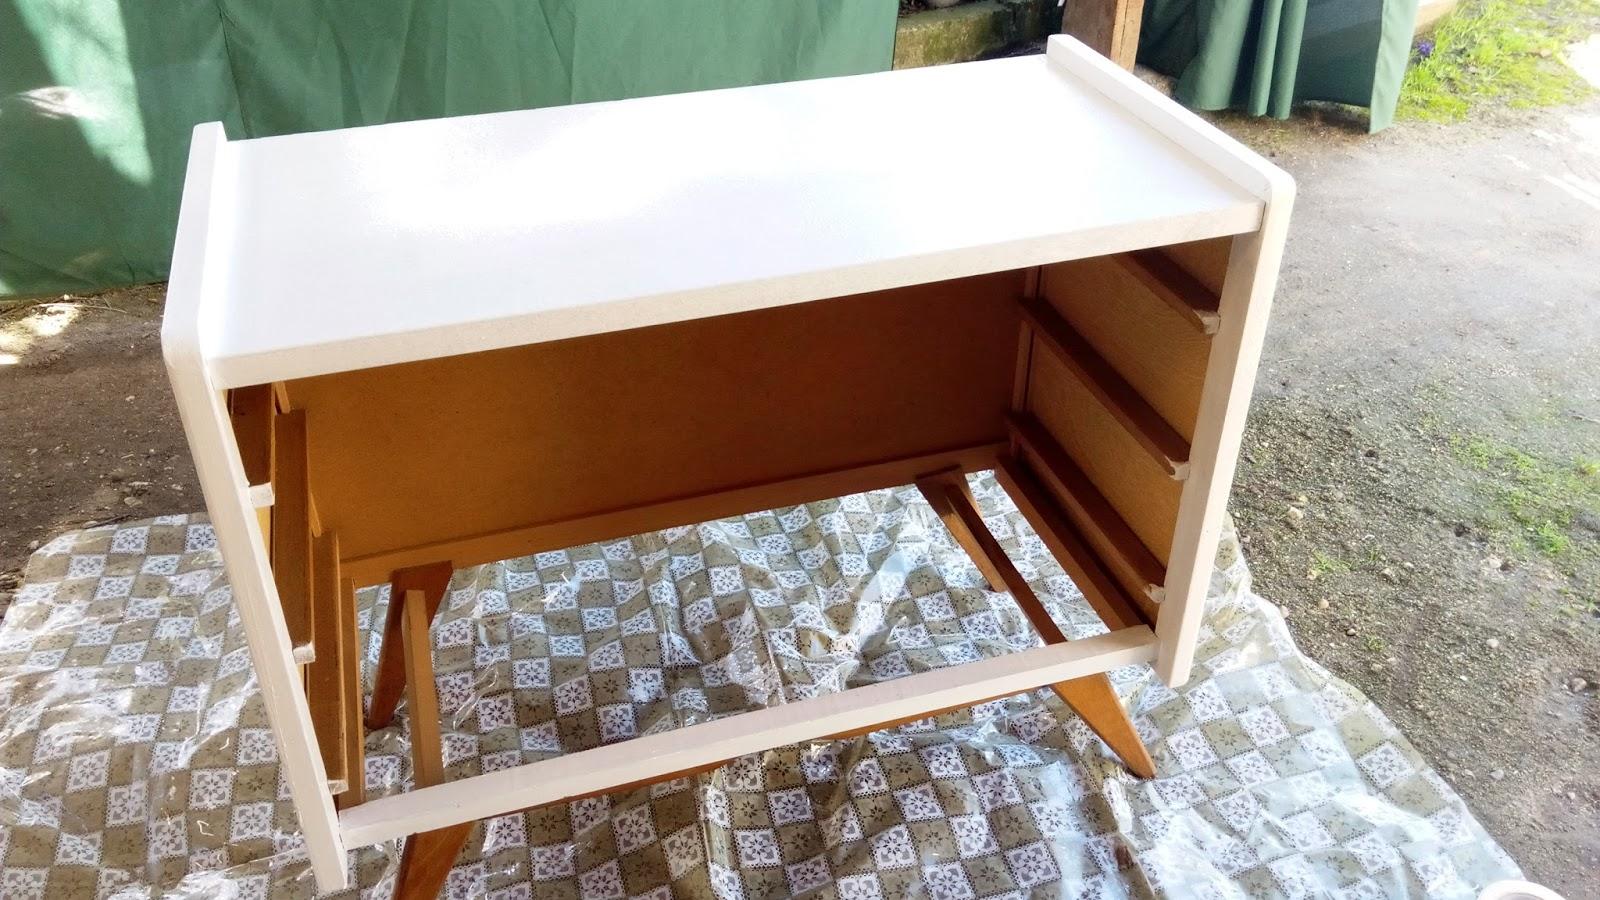 customiser une commode en osier r tro b comme barbbara. Black Bedroom Furniture Sets. Home Design Ideas